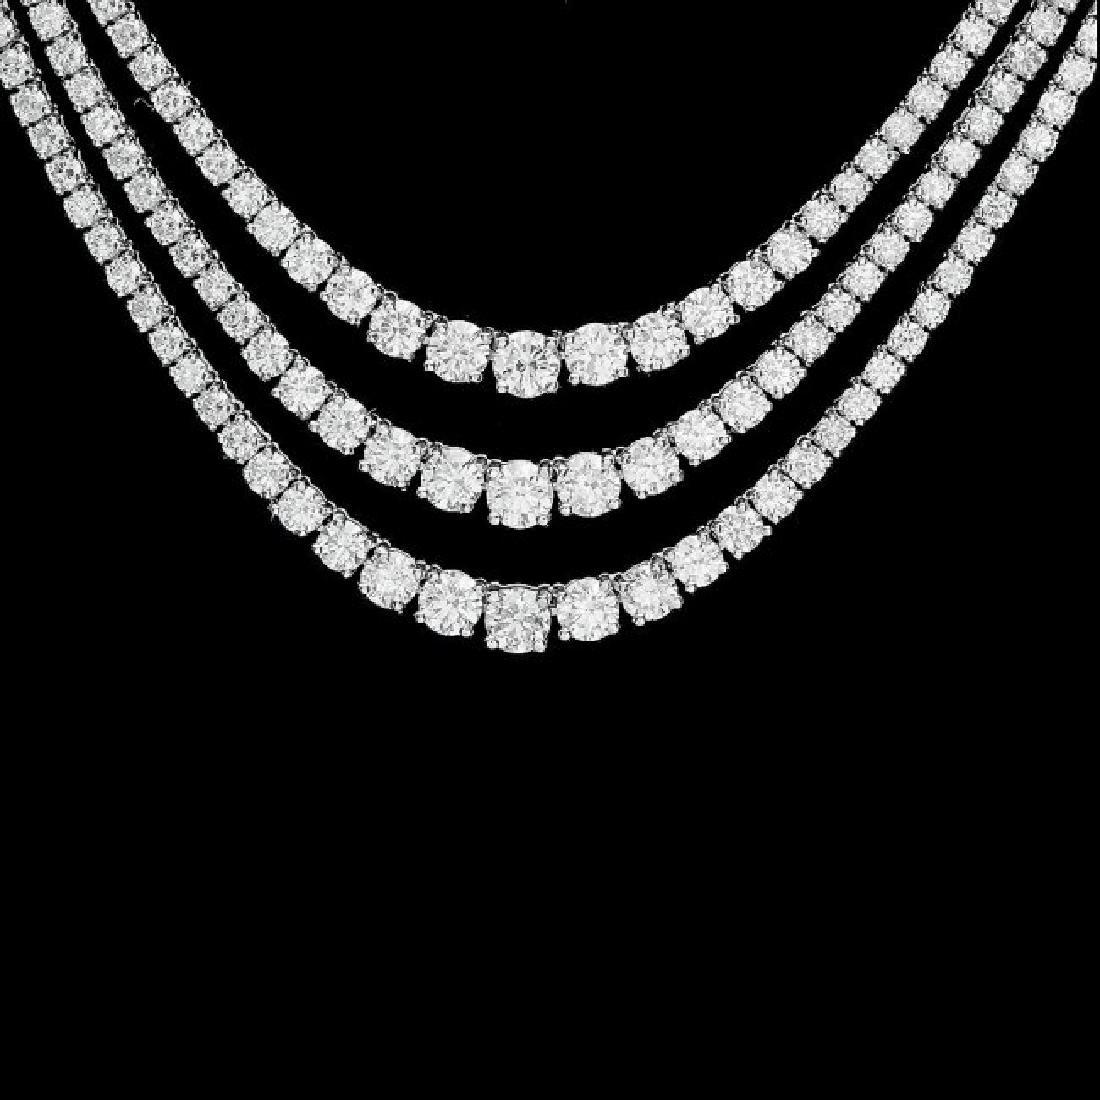 18k White Gold 12.90ct Diamond Necklace - 2